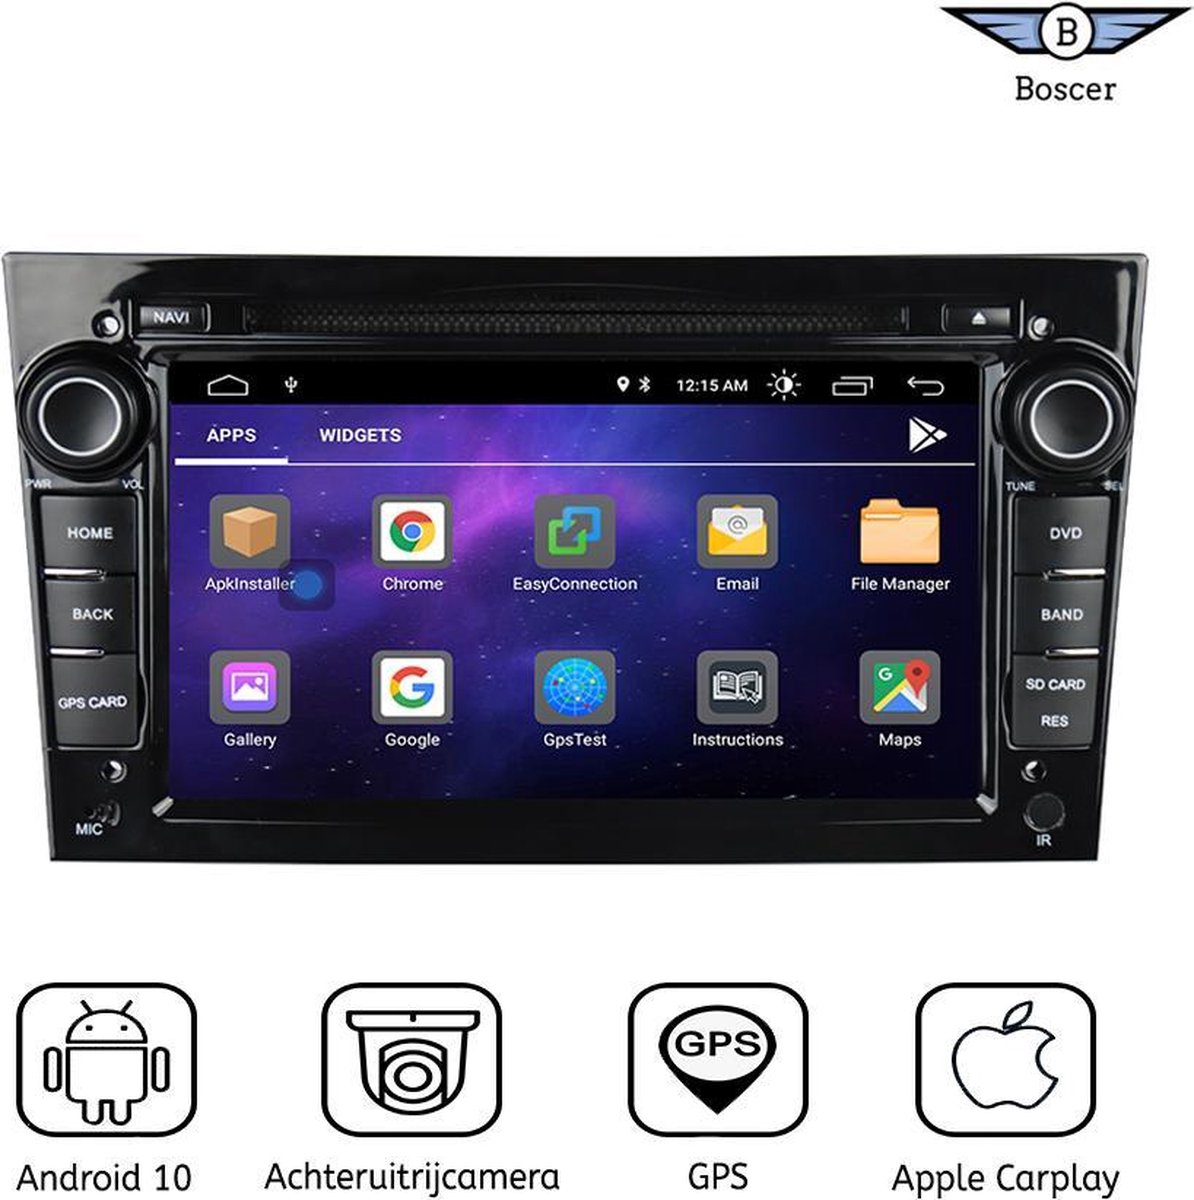 Boscer® Opel Autoradio   Android 10   Apple Carplay   Android Auto   Navigatiesysteem   DVD & CD   Zwart   Achteruitrijcamera